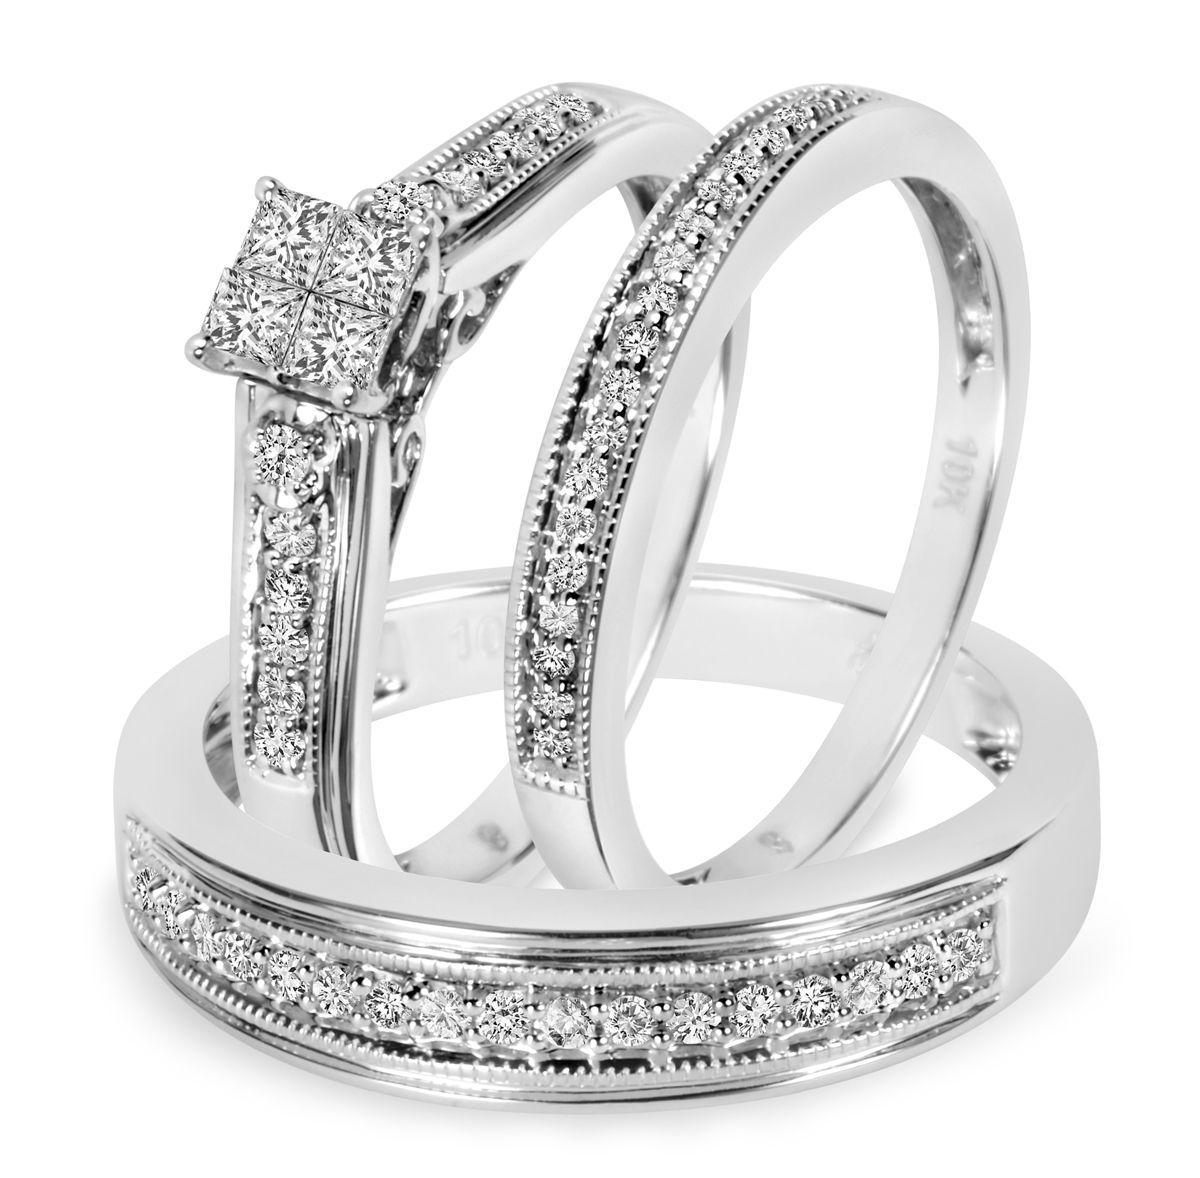 1 2 Carat T W Diamond Trio Matching Wedding